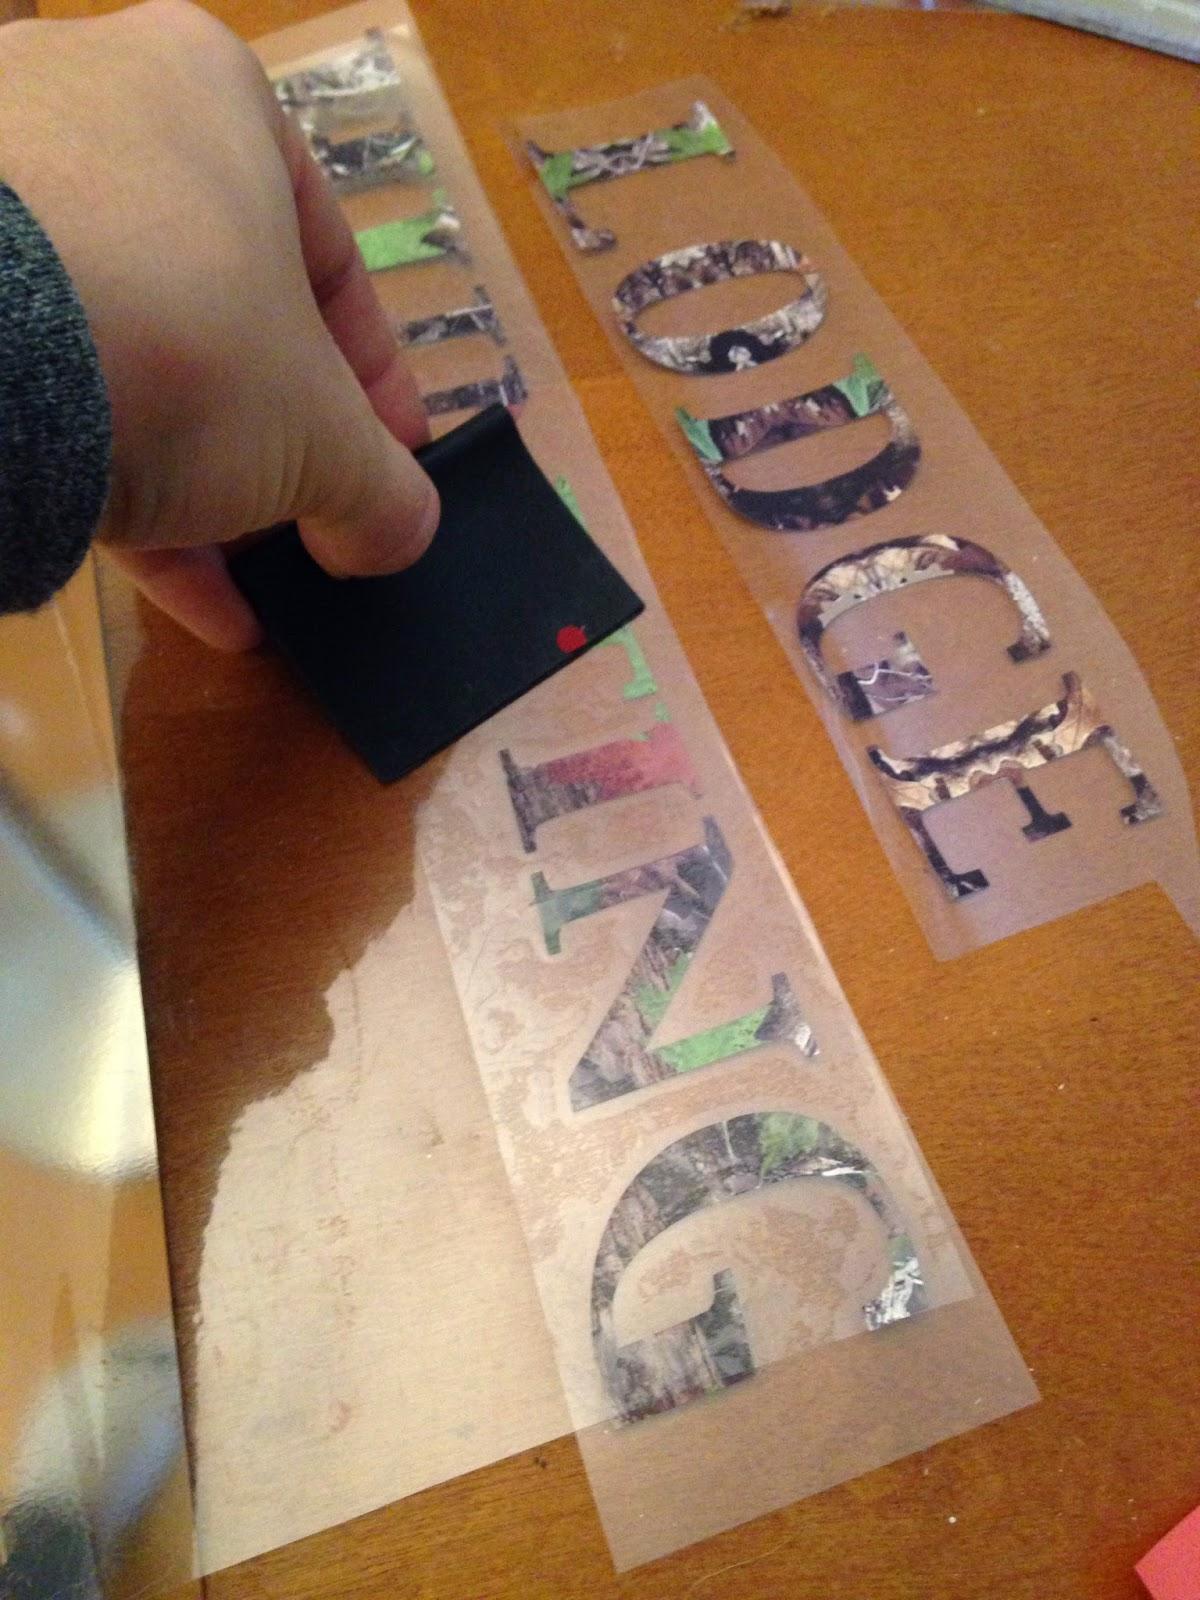 Silhouette tutorial, HTV, heat transfer vinyl, no transfer sheet, Silhouette scraper